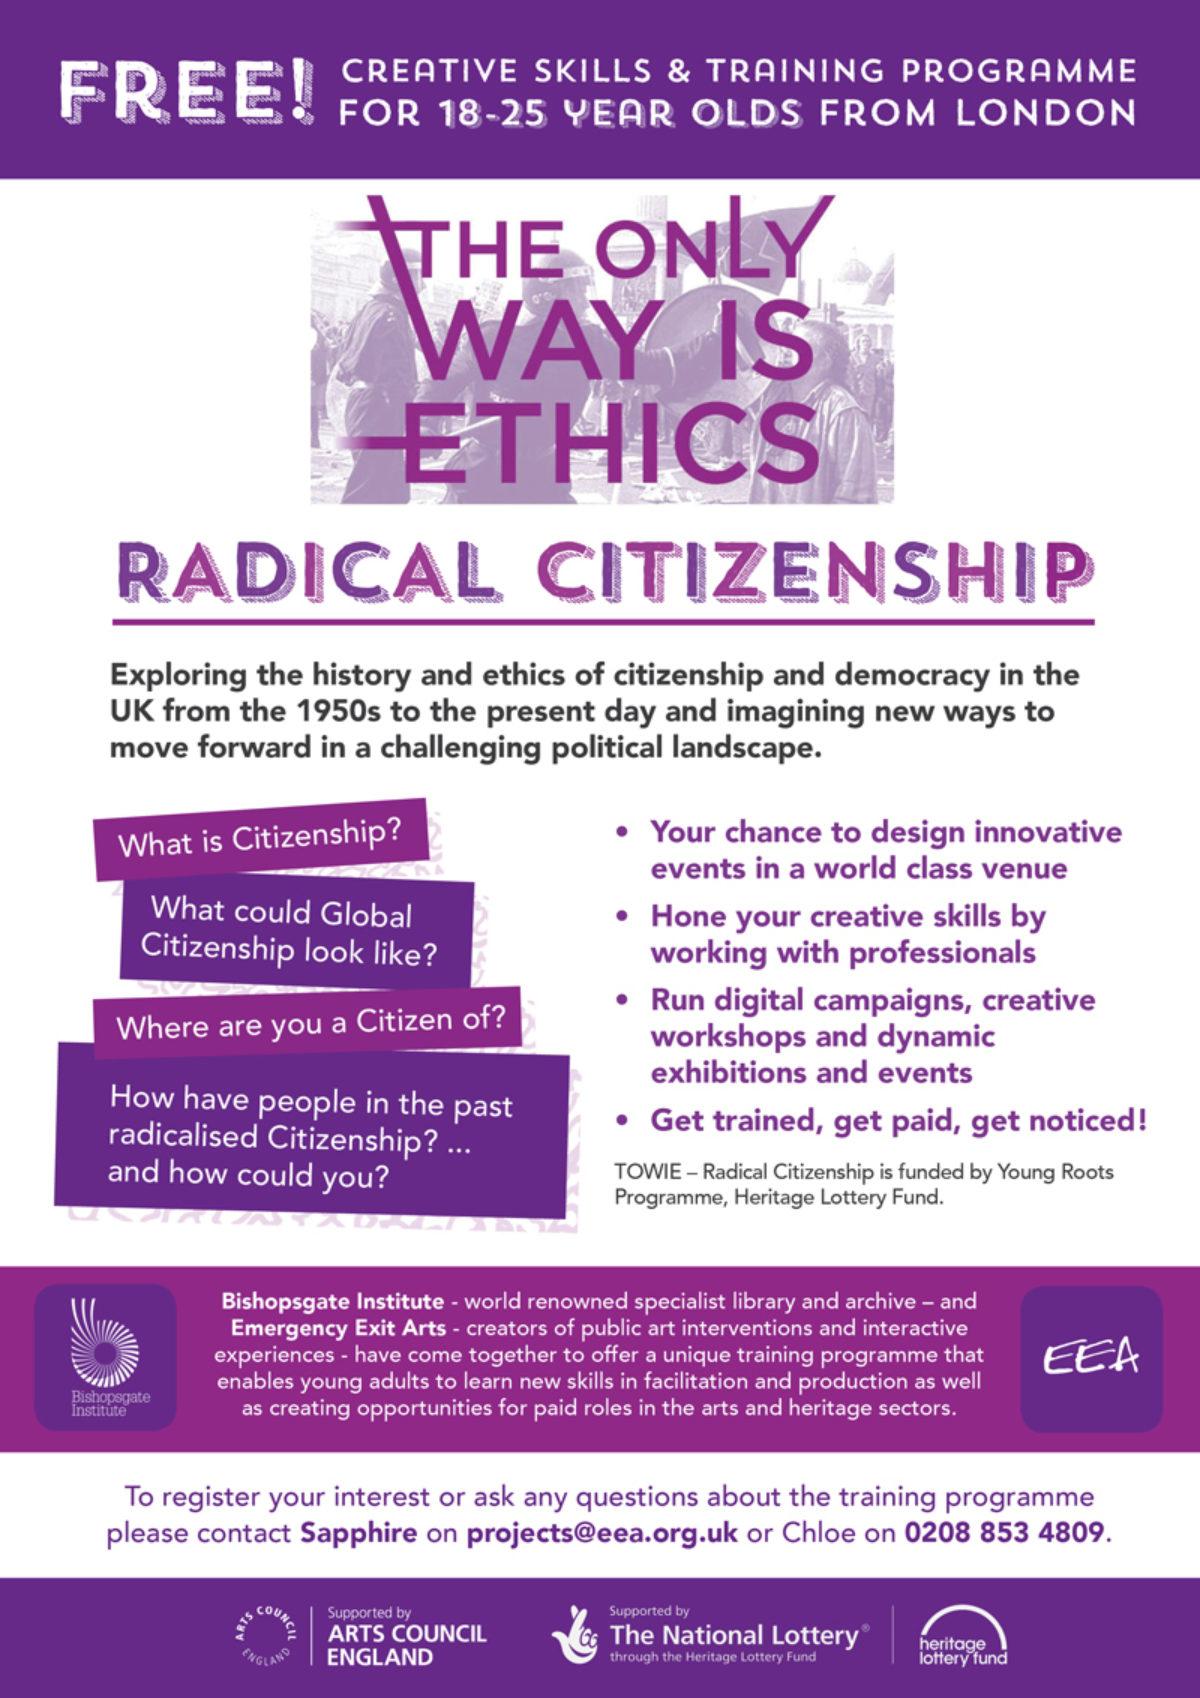 Towie Radical Citizenship